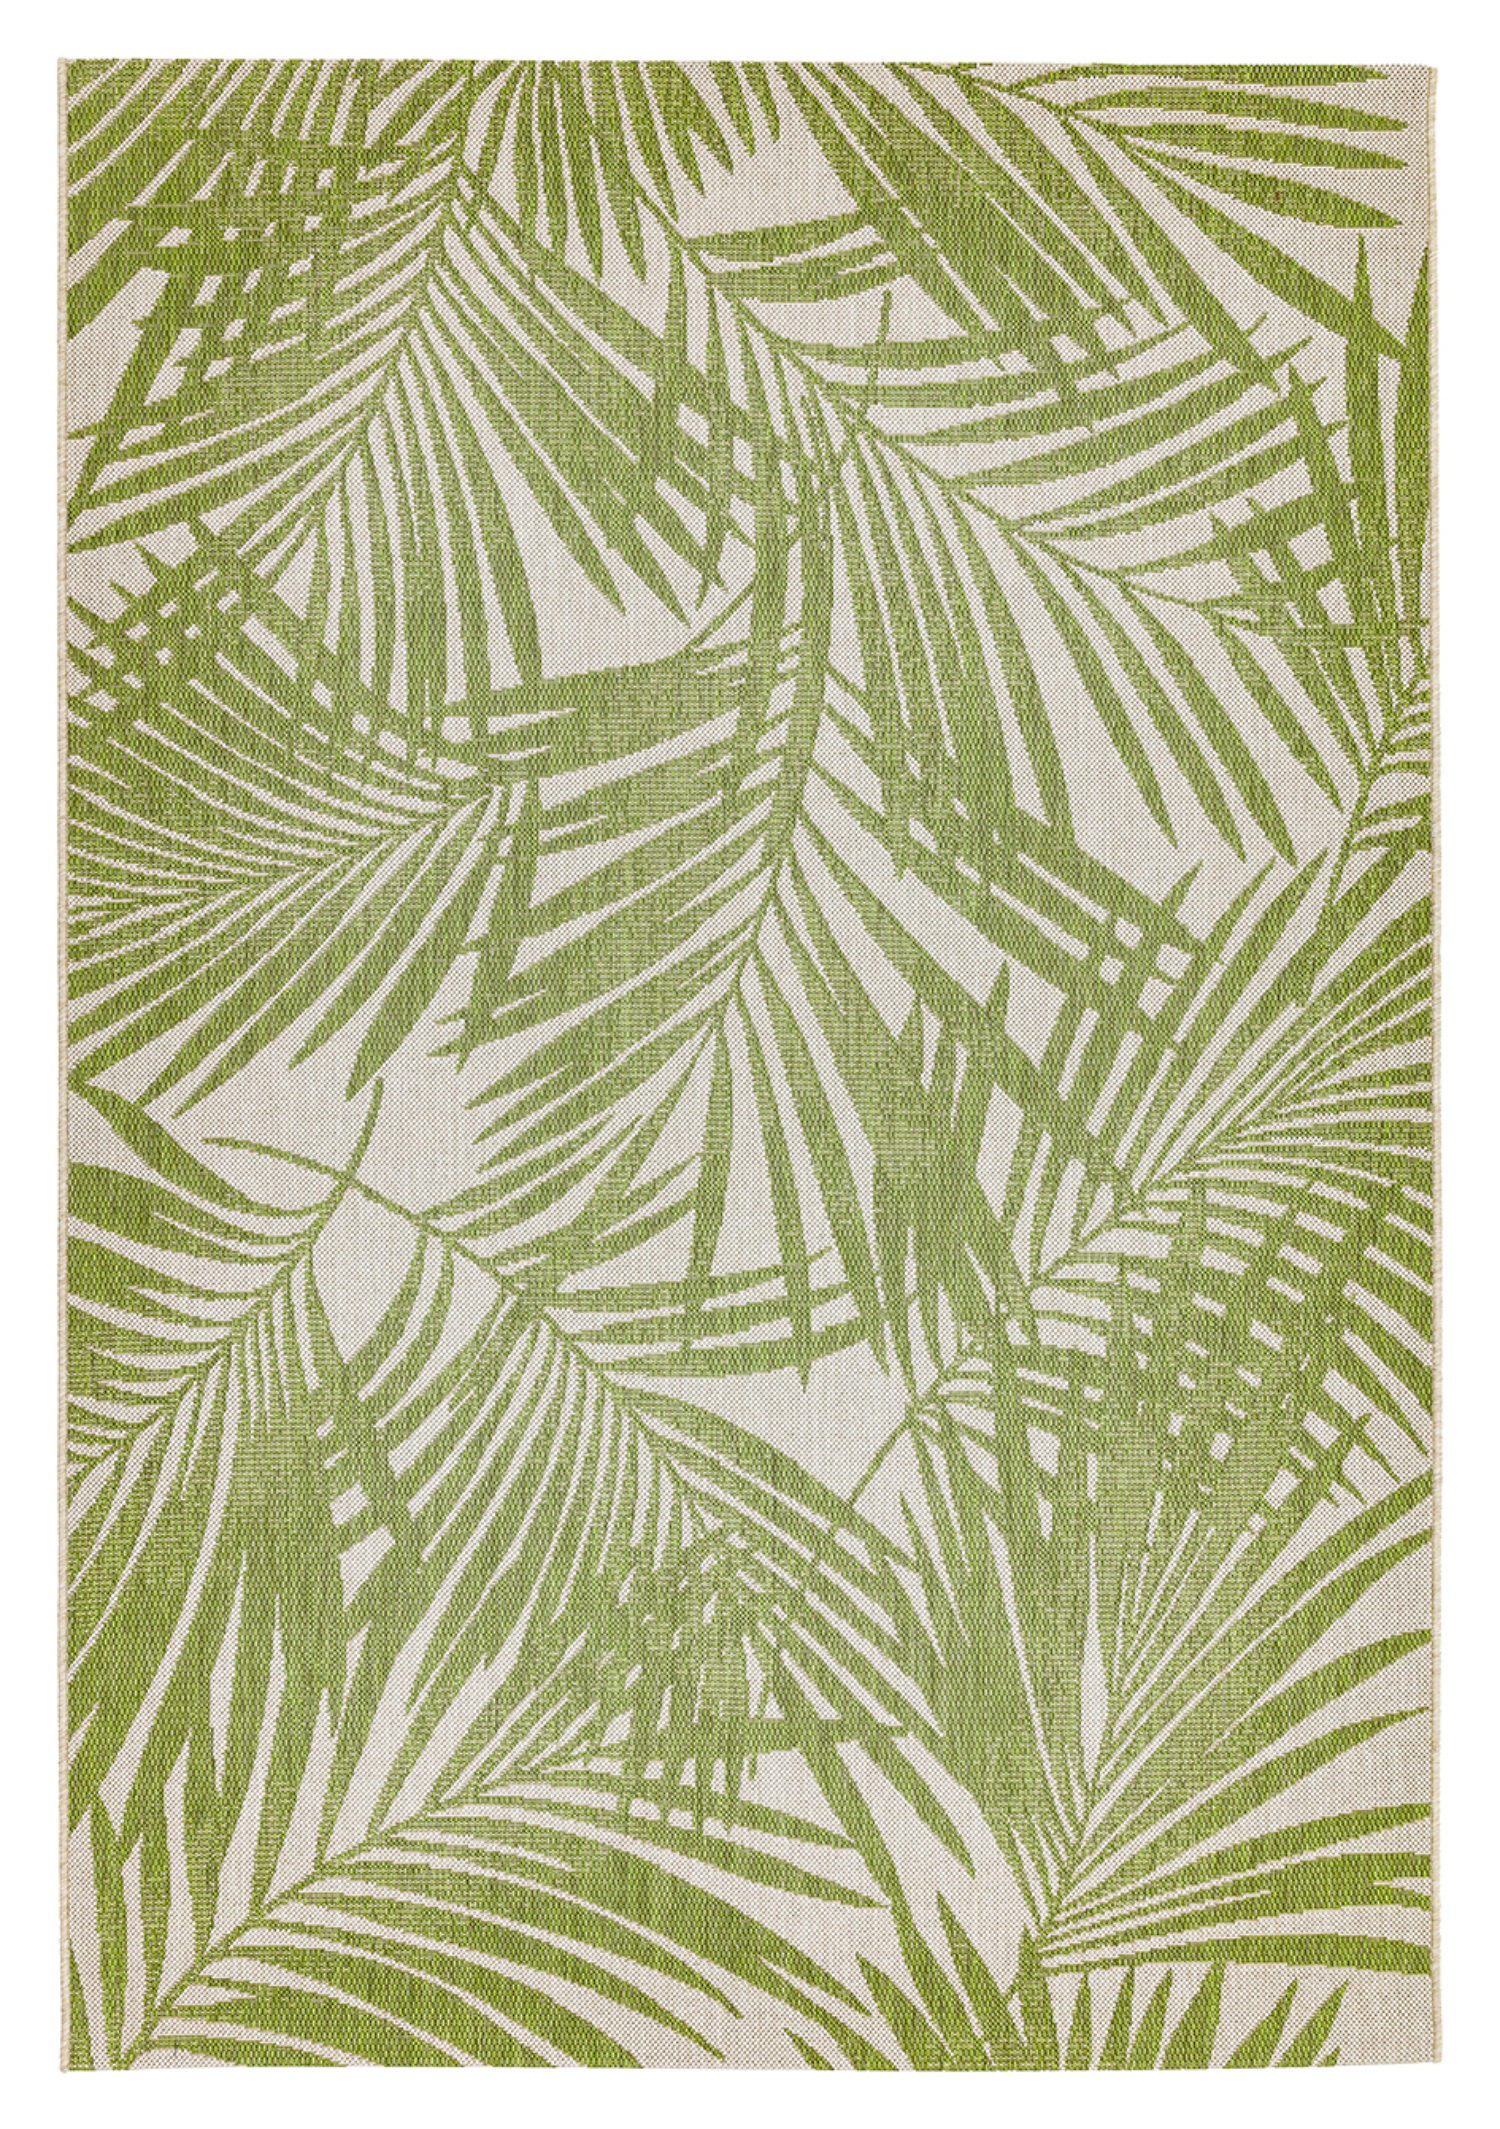 Pergola Green Palm